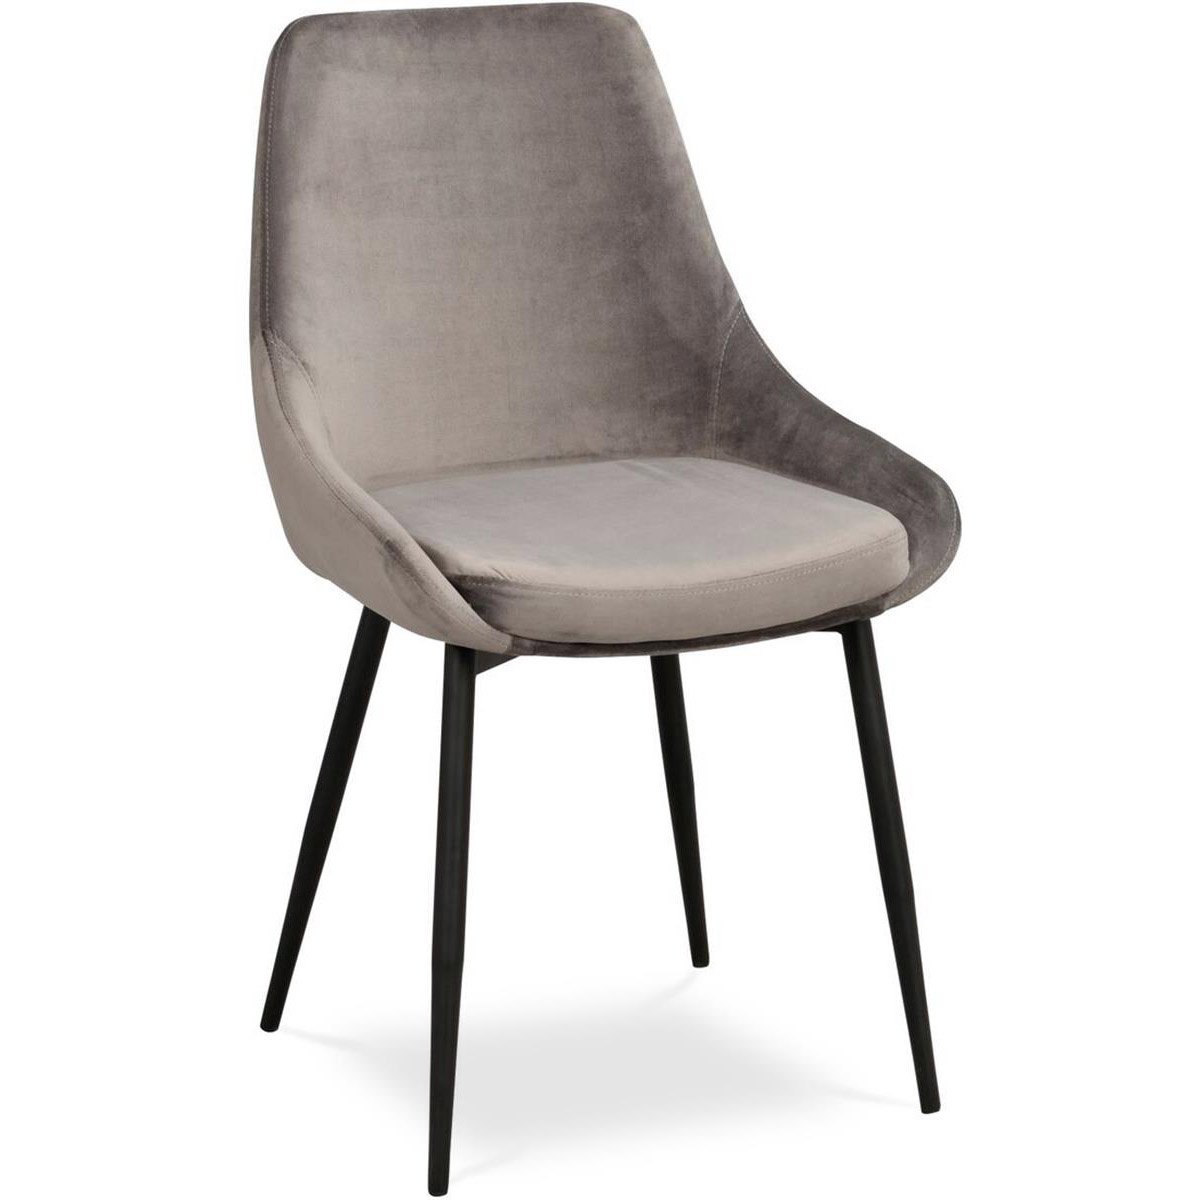 Ebbot stol sammet grå